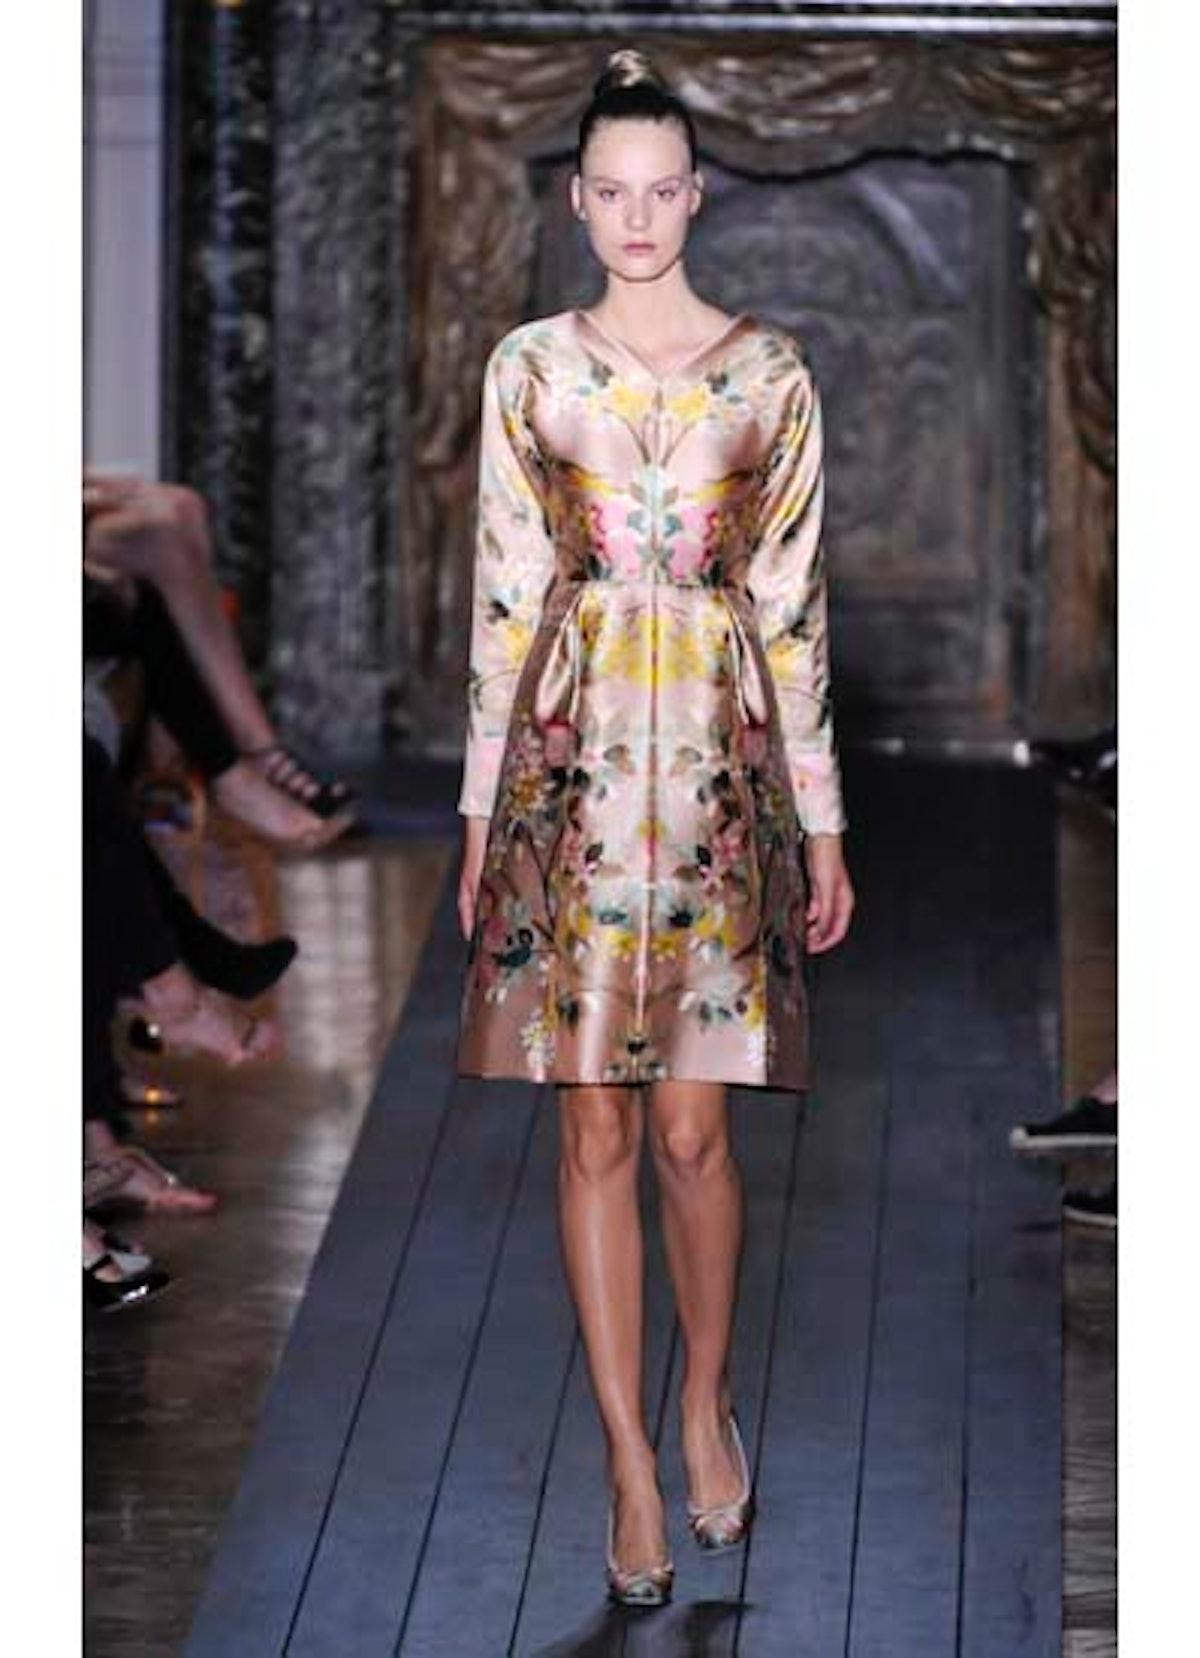 fass-valentino-couture-2012-runway-16-v.jpg